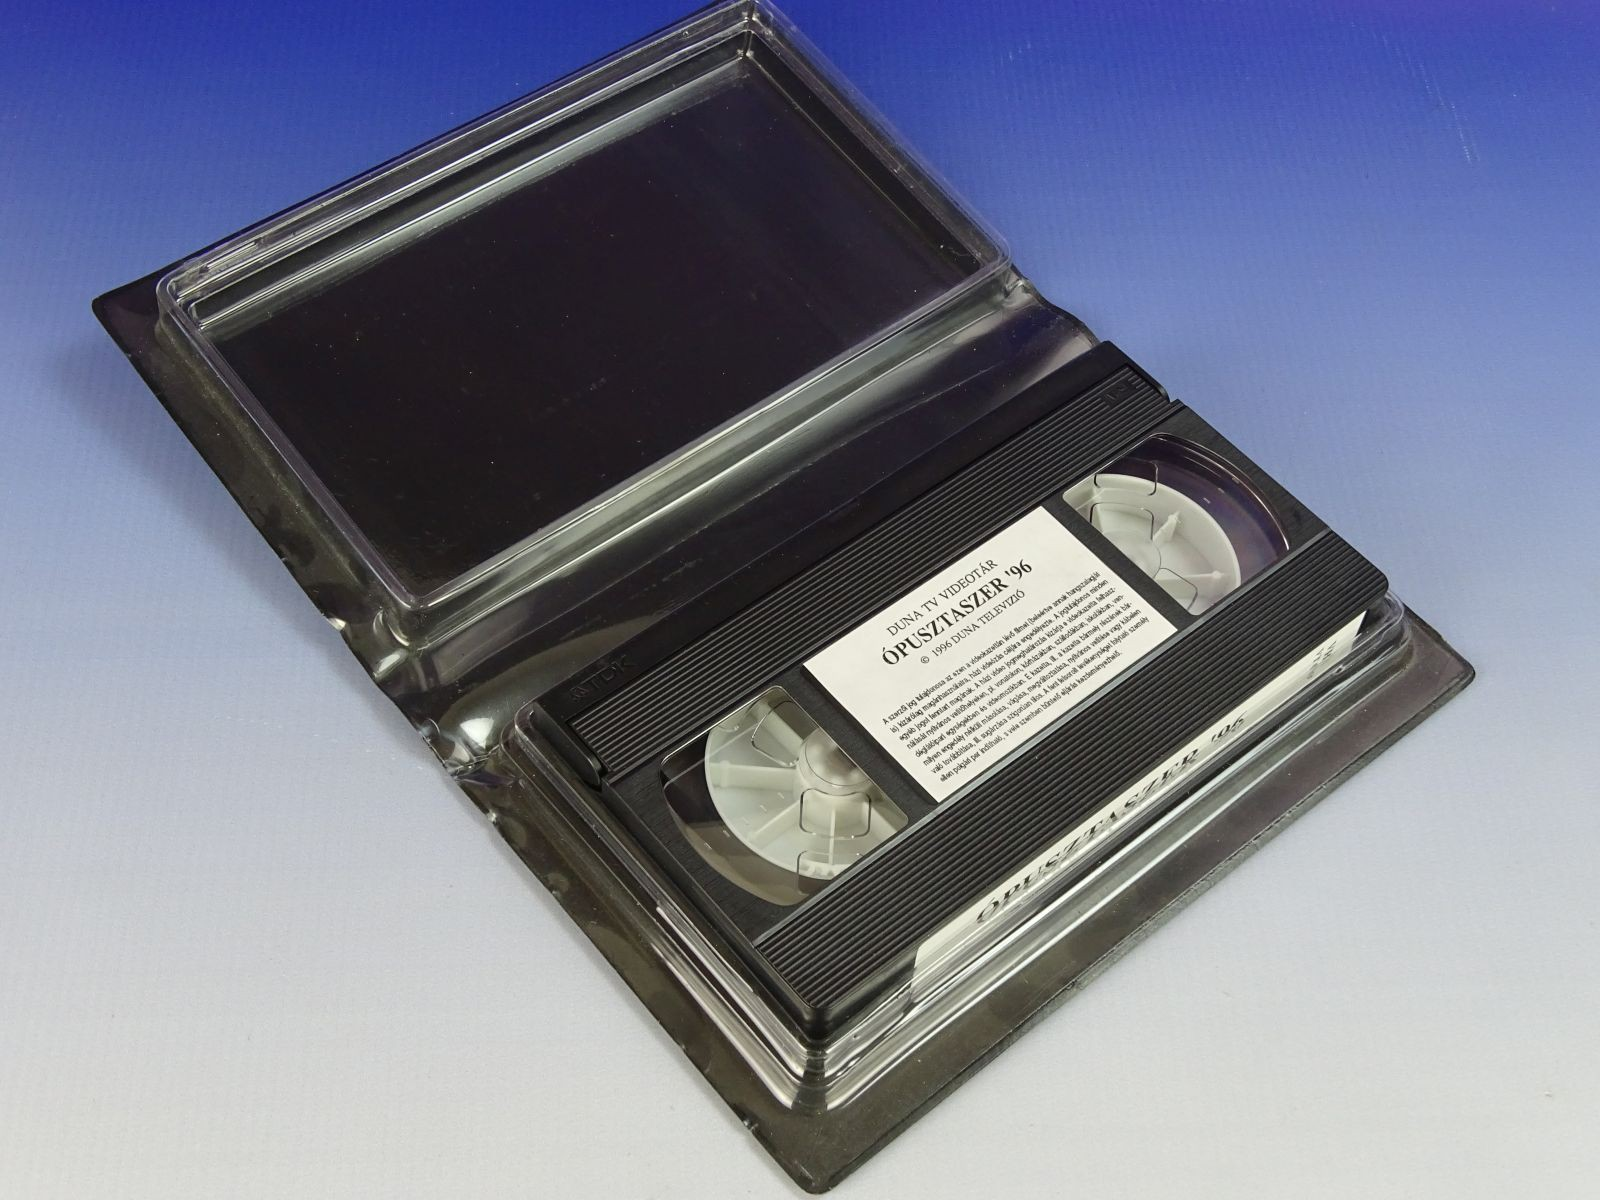 DSC07766.JPG (1600�1200)